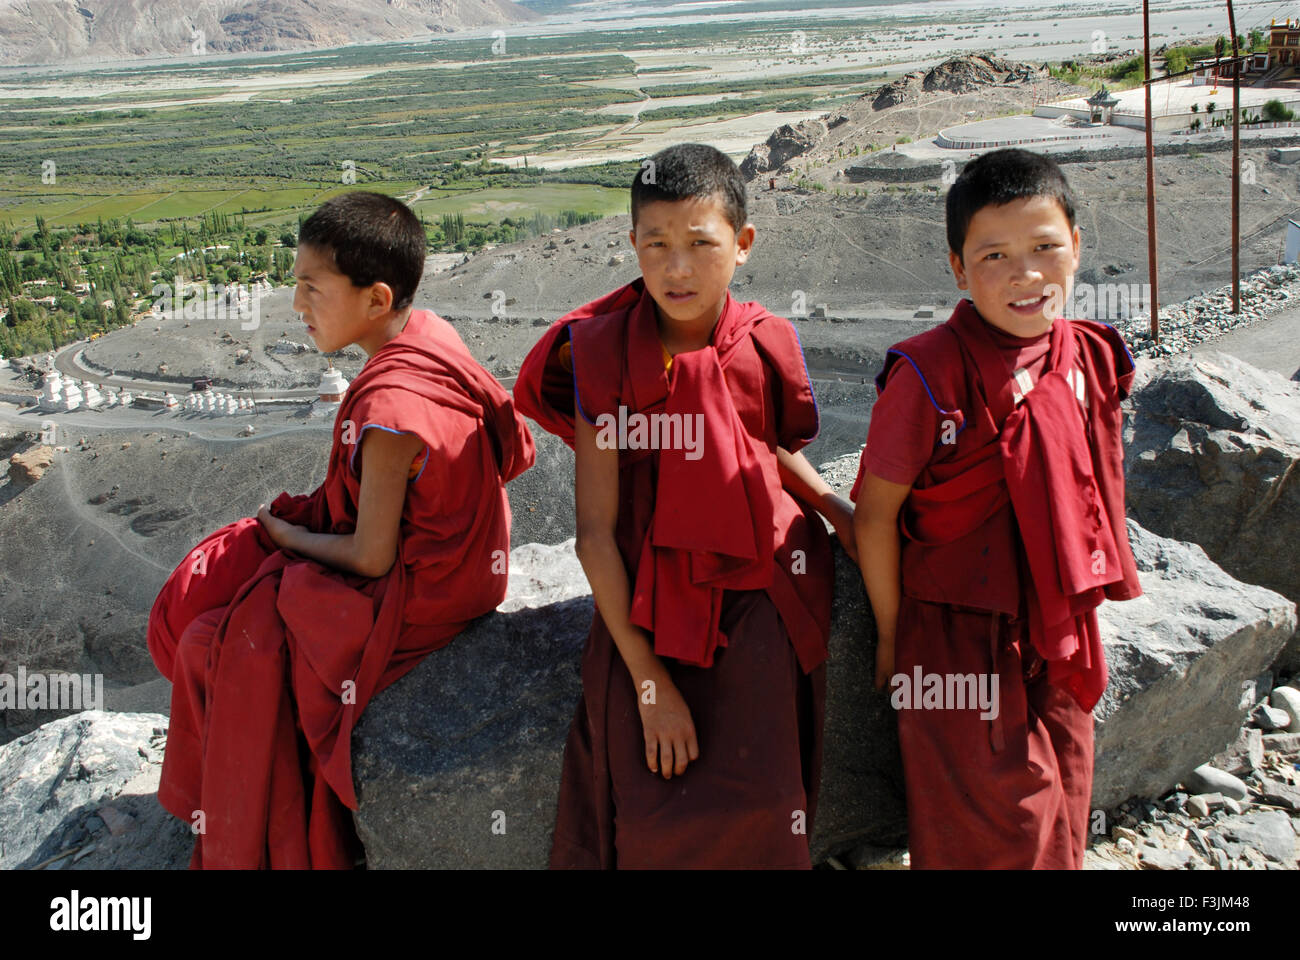 Three young Lama children at Diskit Monastery at Ladakh ; Jammu & Kashmir ; India - Stock Image